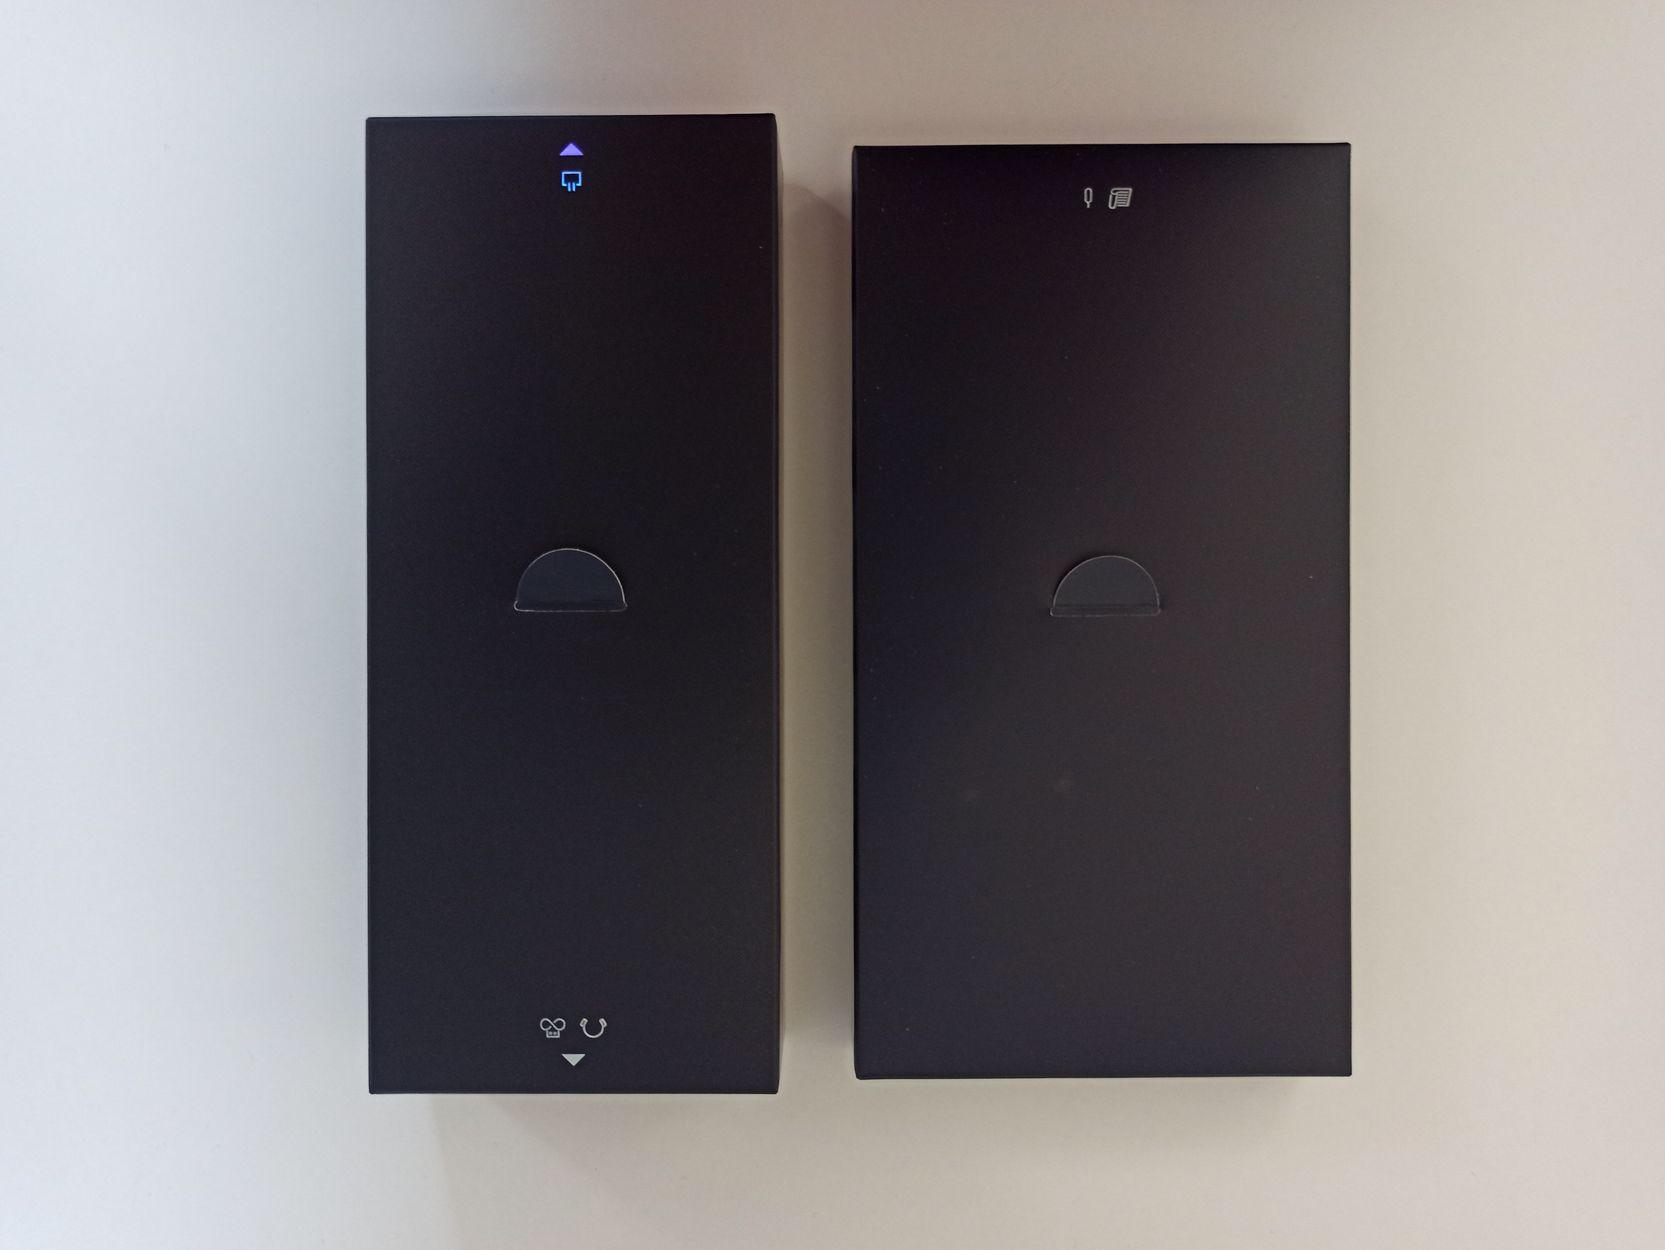 unboxing pudełka X51 5G